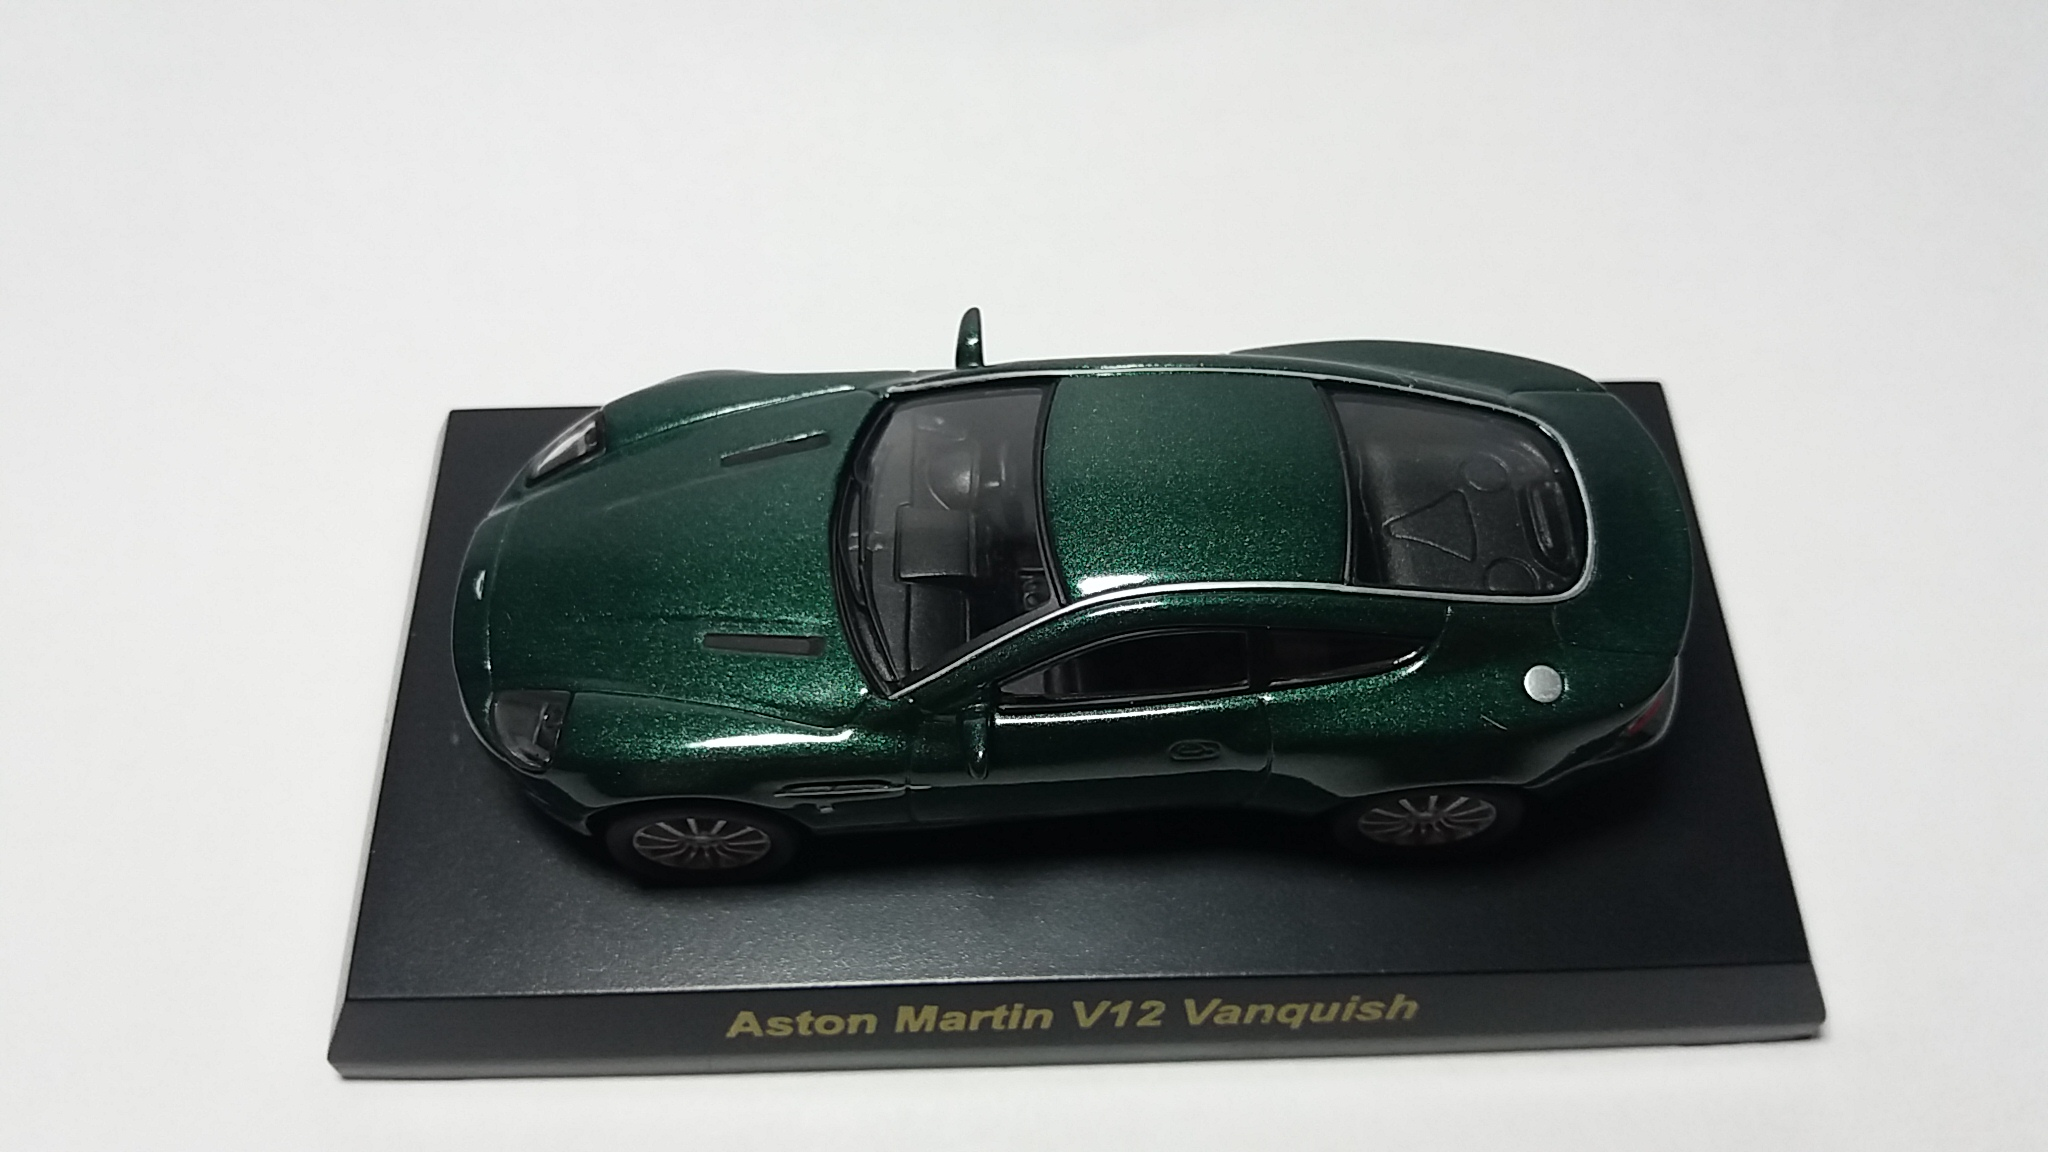 ASTON MARTIN V12 VANQUISH od KYOSHO 1 64 oficjalne